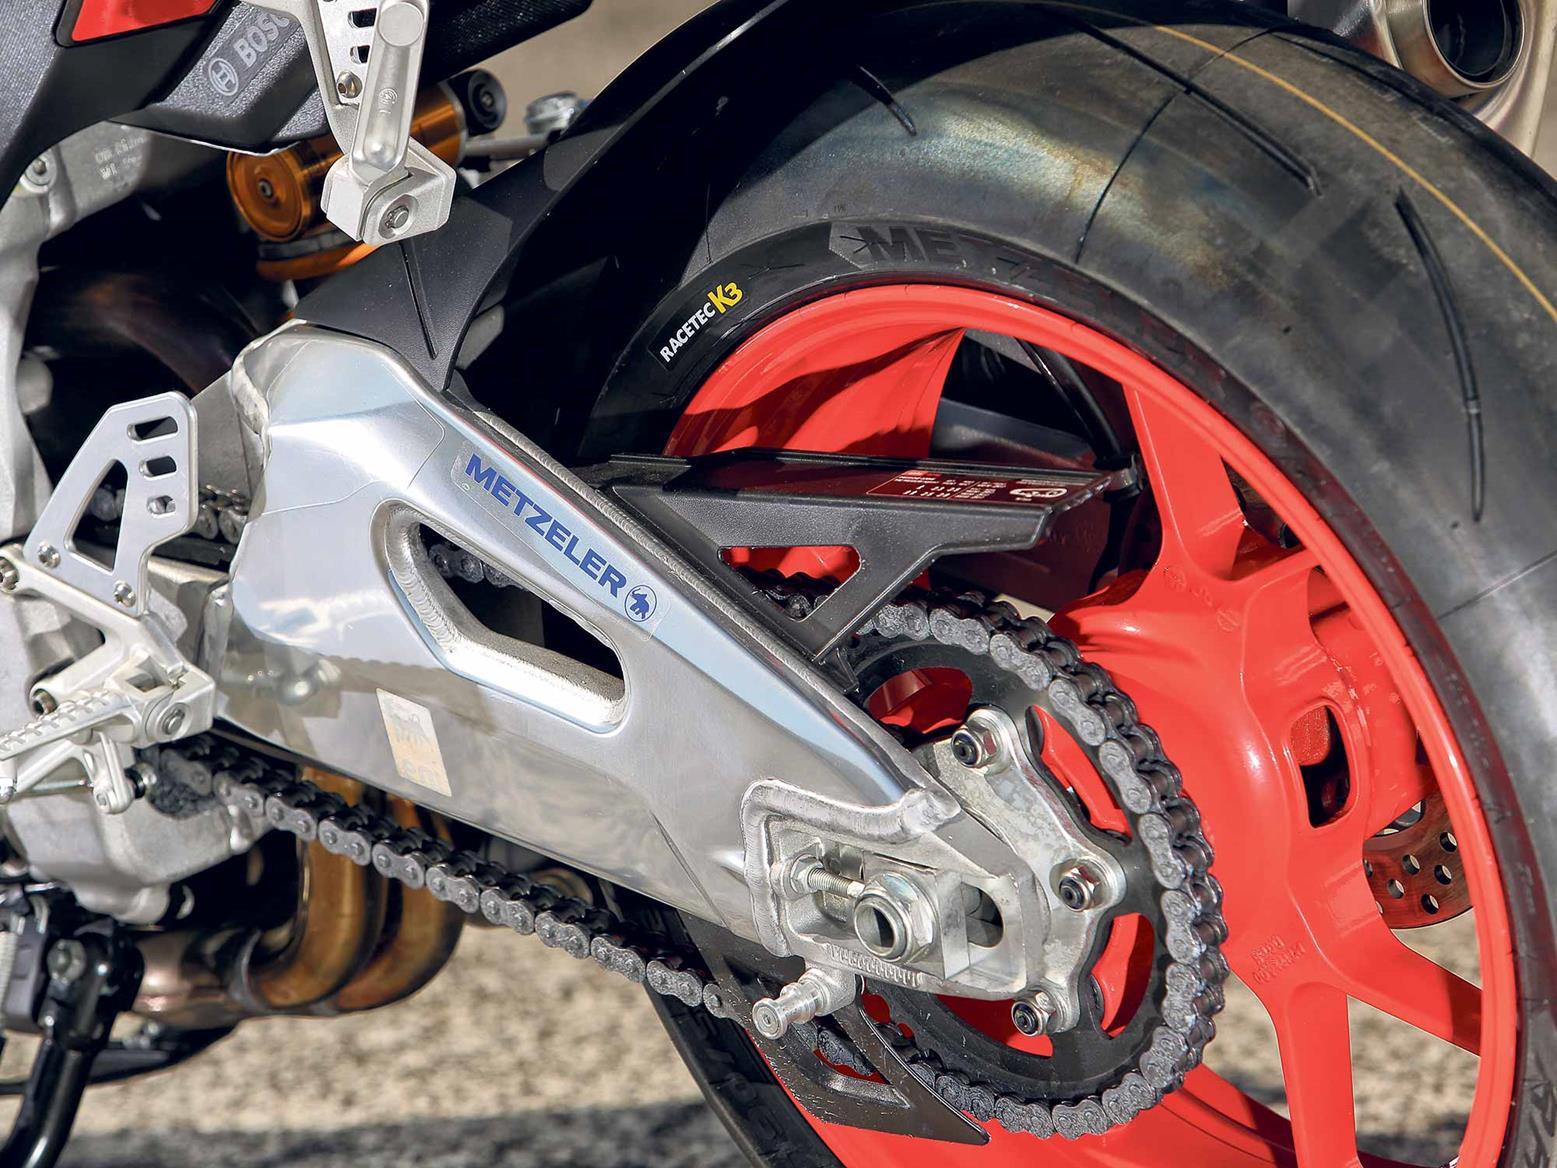 Aprilia Tuono V4 1100 Factory swing arm